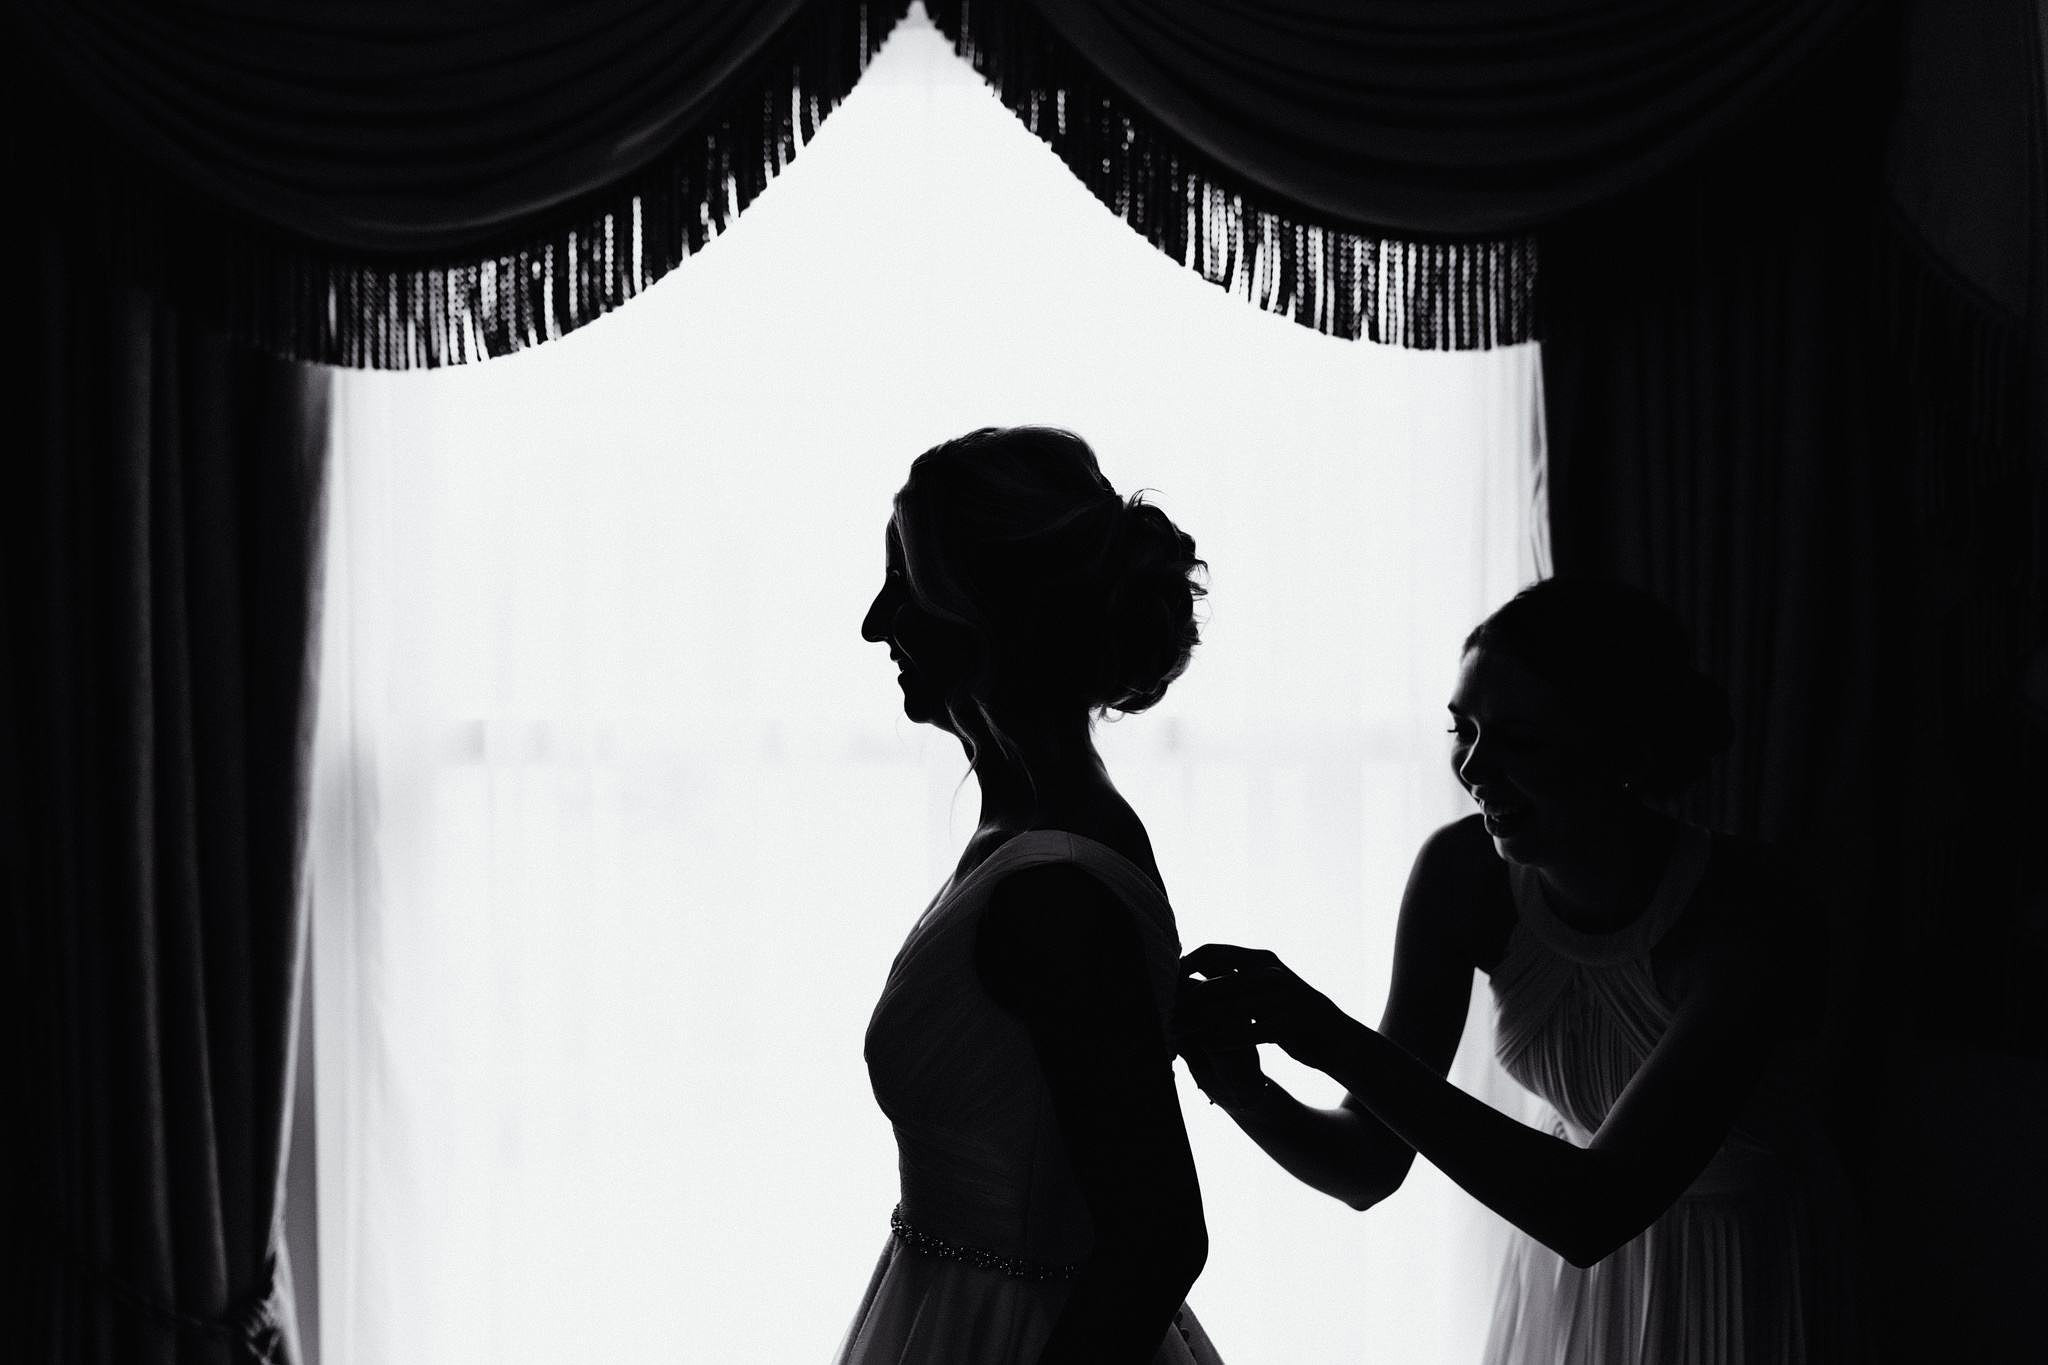 a silhouette photograph